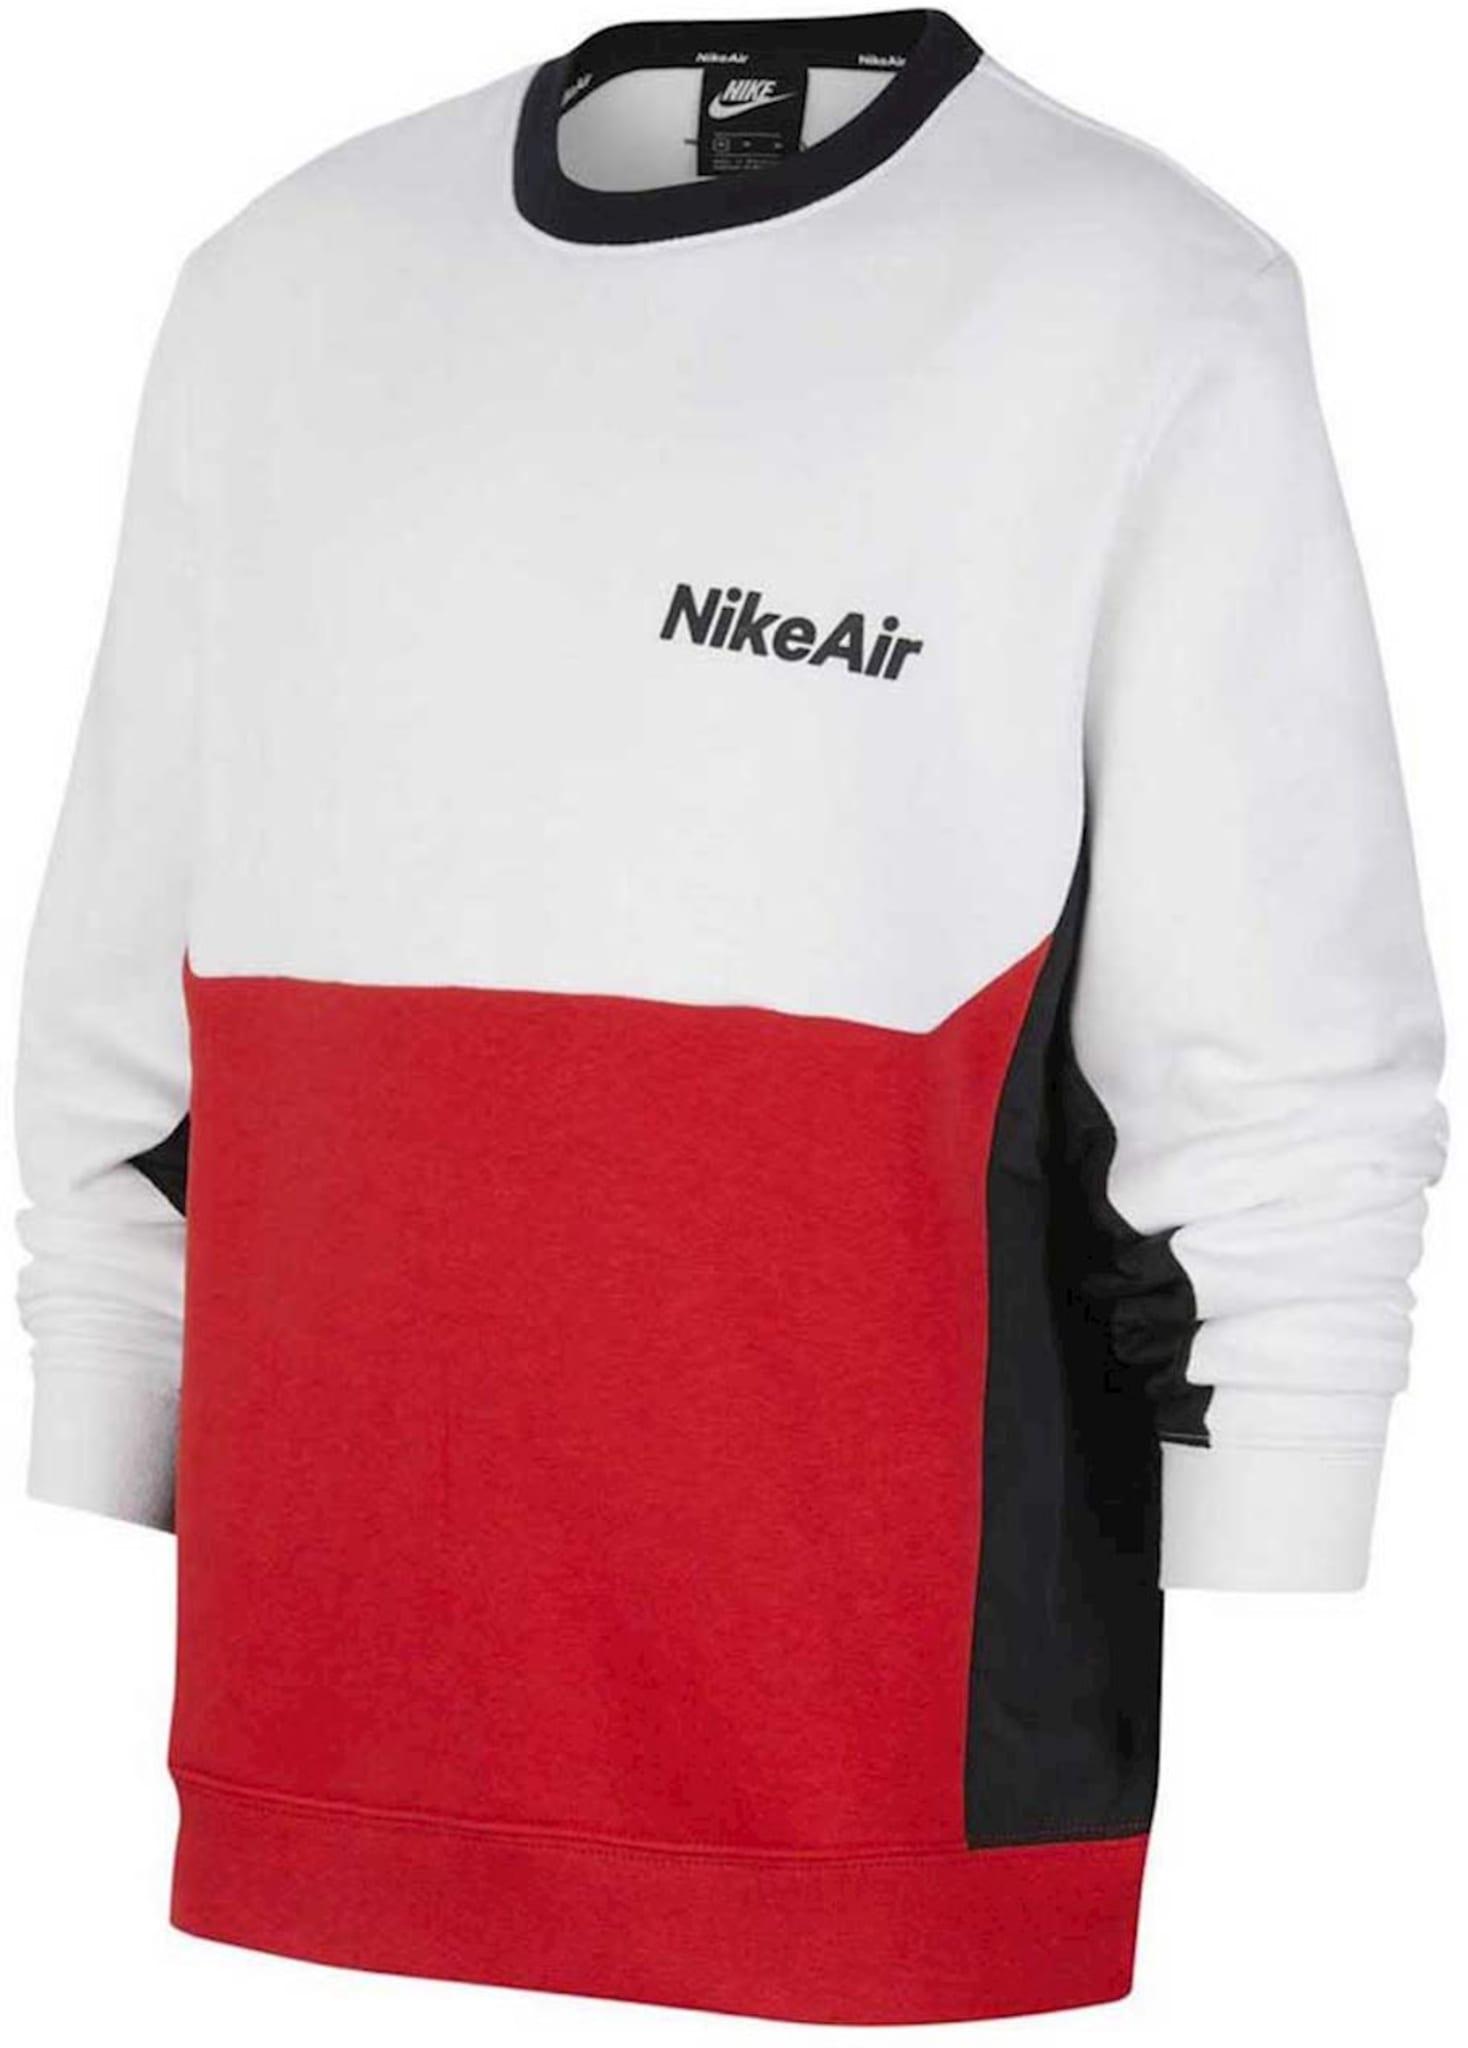 Nike Air Big Kids' Long Sleeve Crew